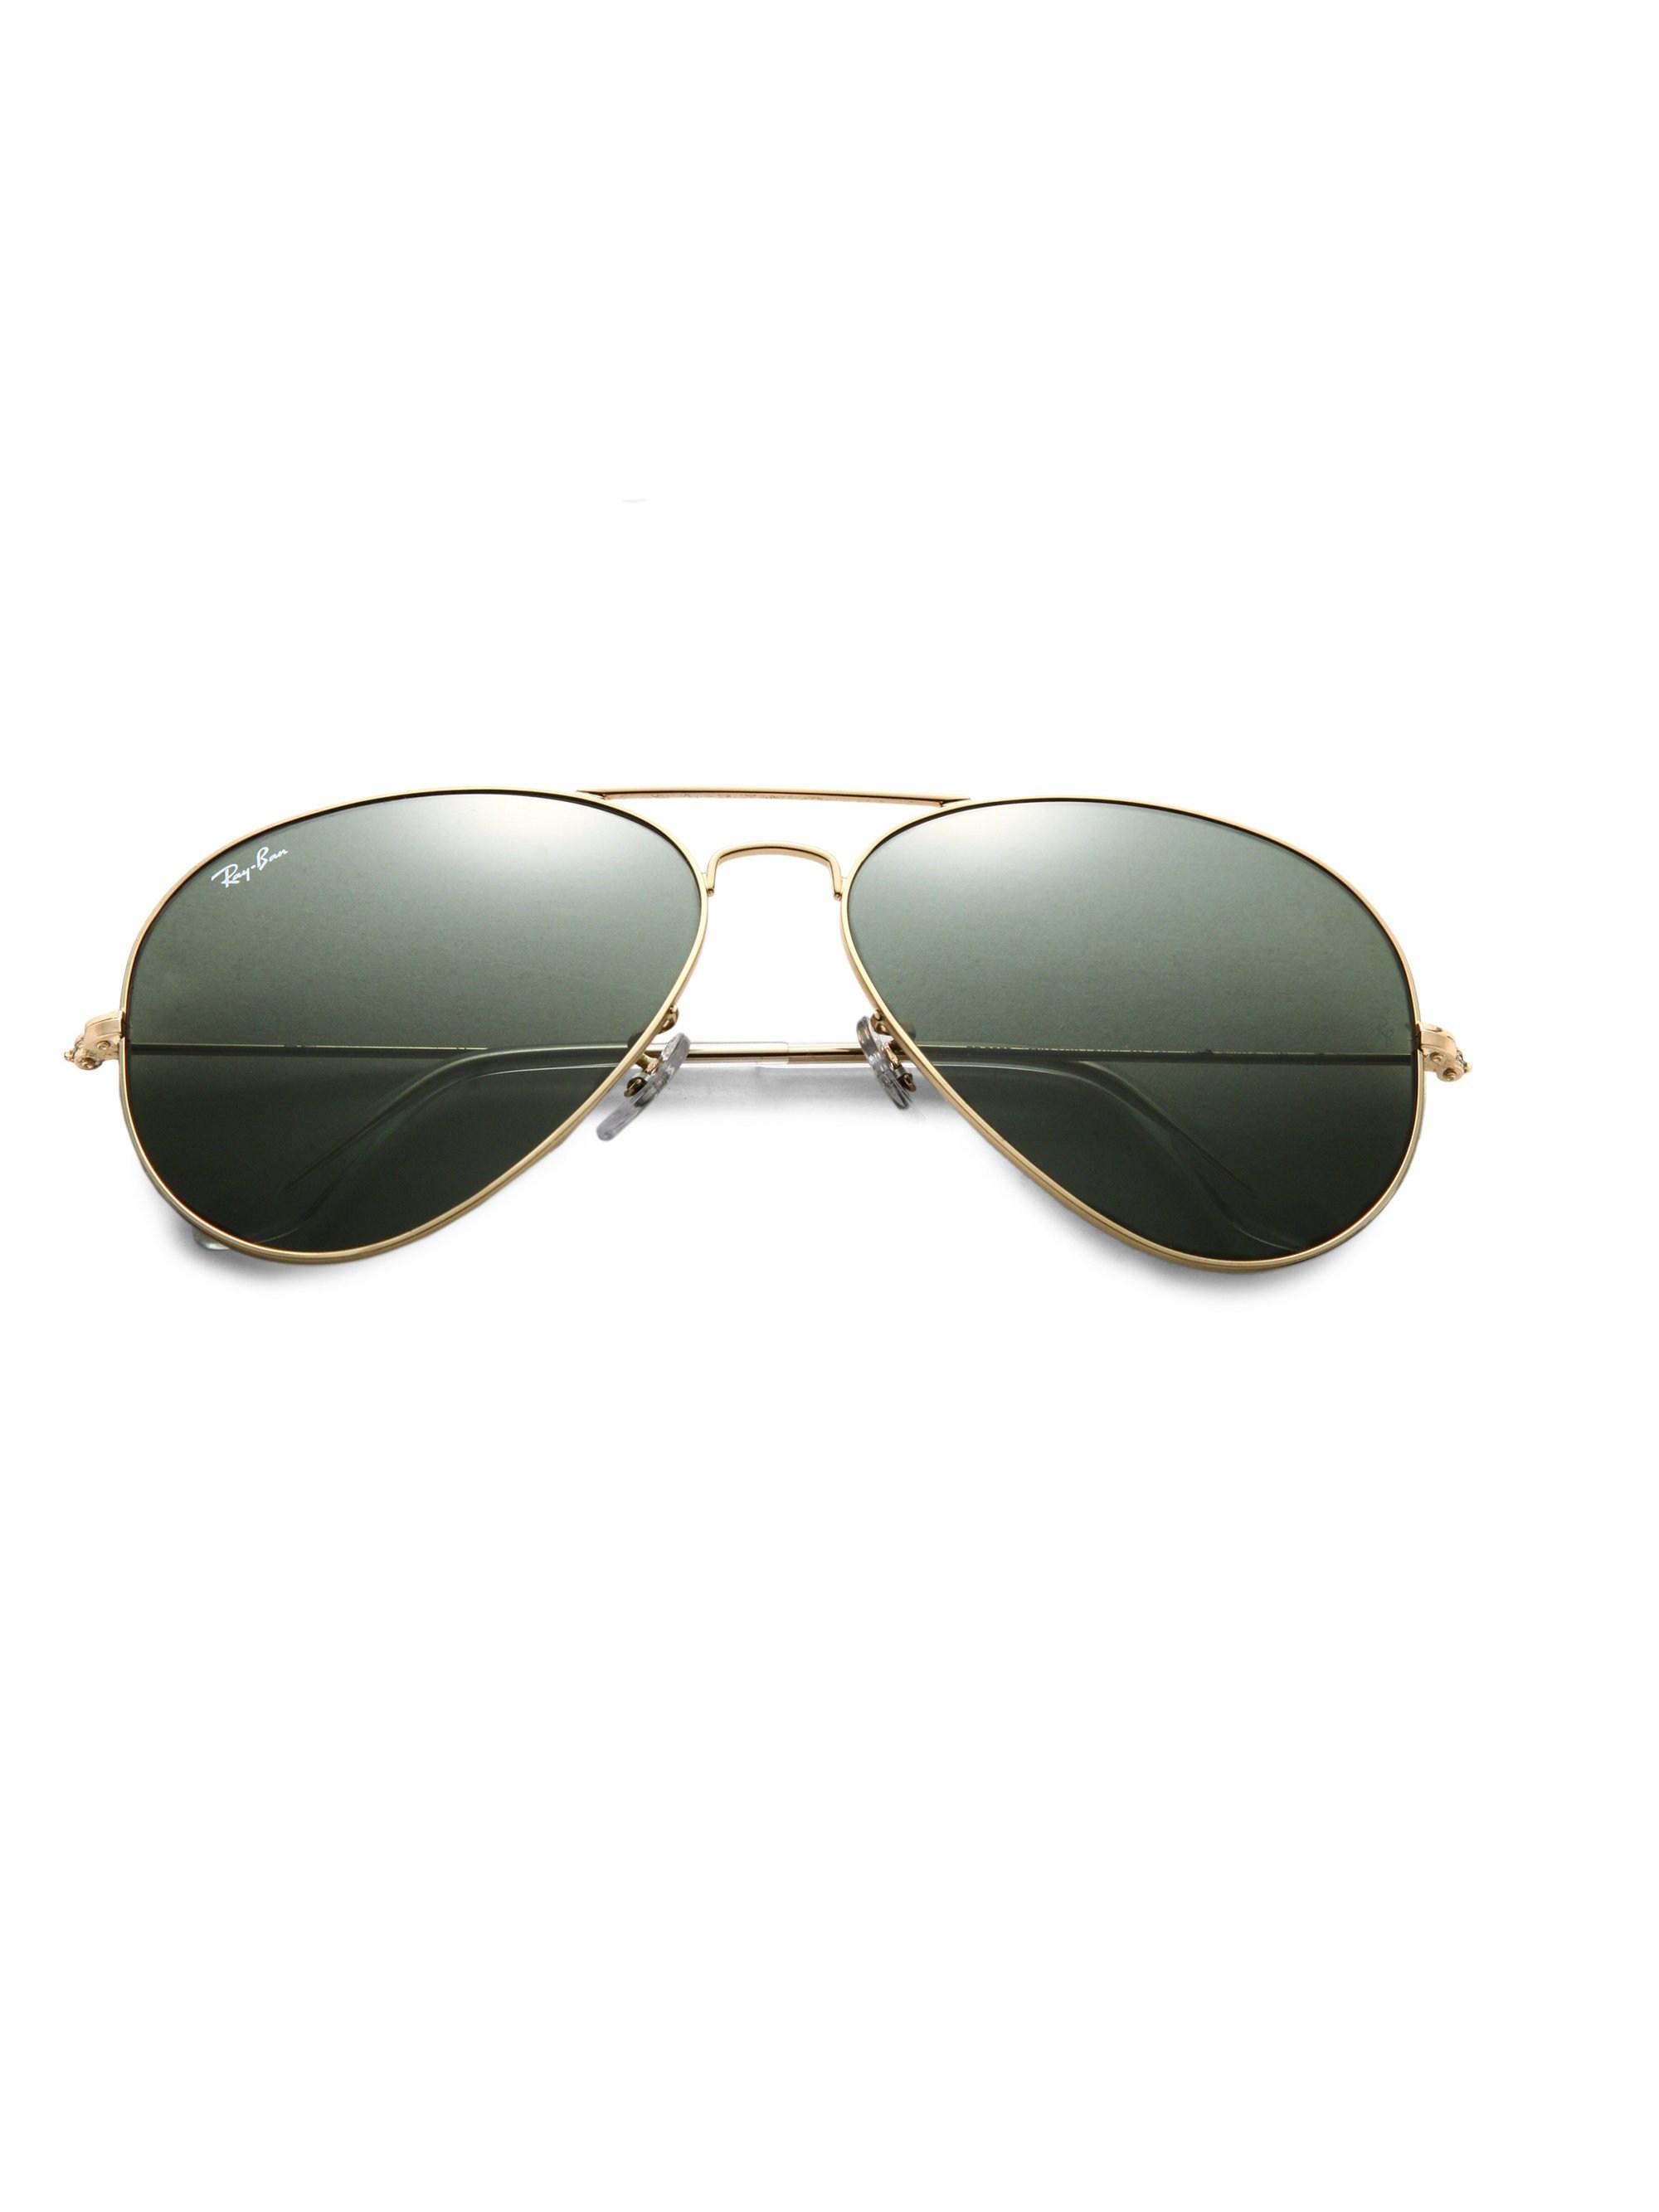 942d8771cf Lyst - Ray-Ban Men s Original 62mm Aviator Sunglasses - Gold in ...